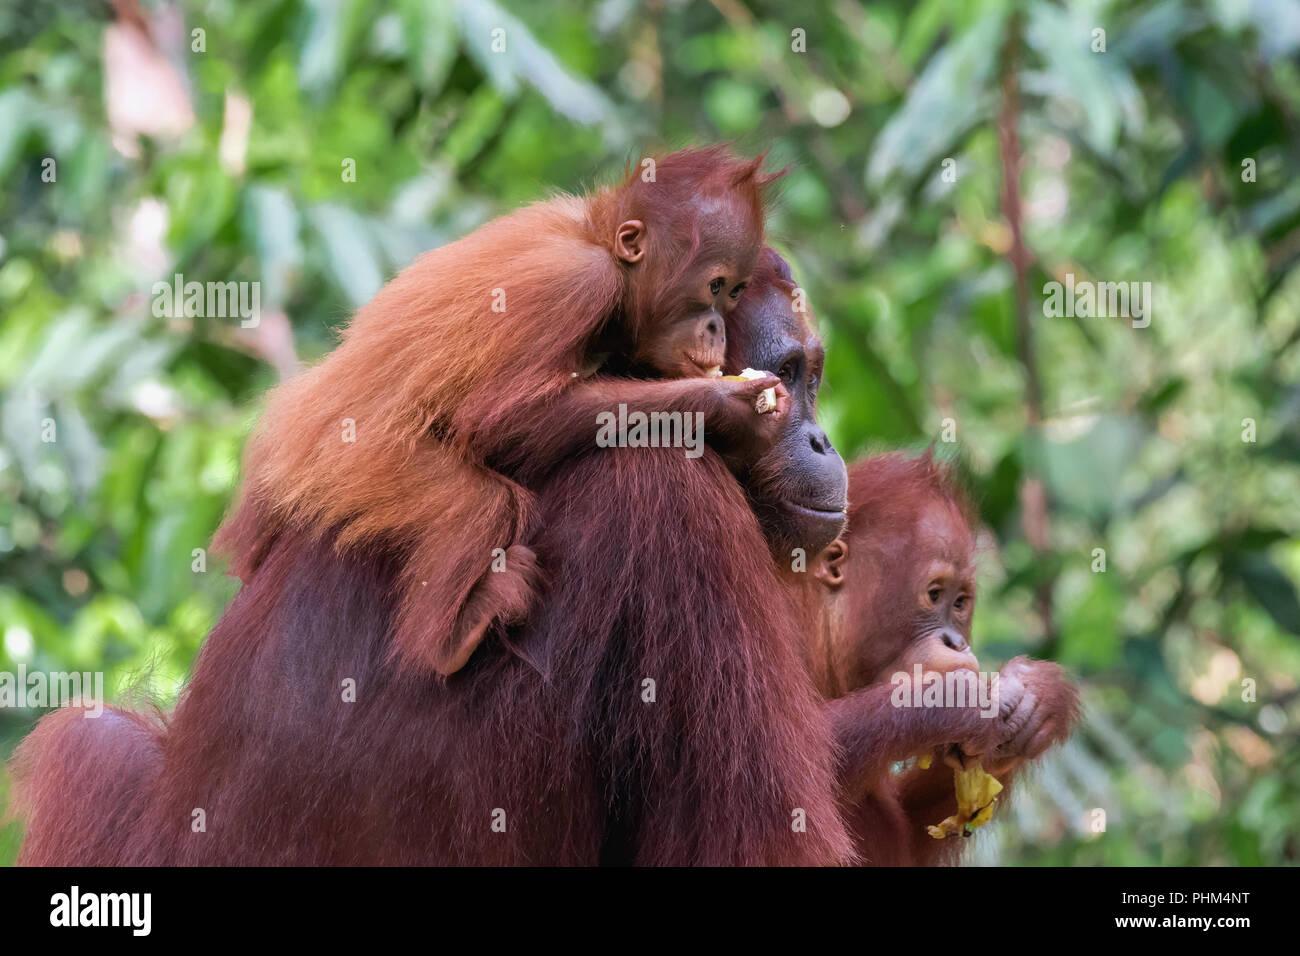 Orangutan family at the feeding station, Tanjung Puting National Park, Kalimantan - Stock Image